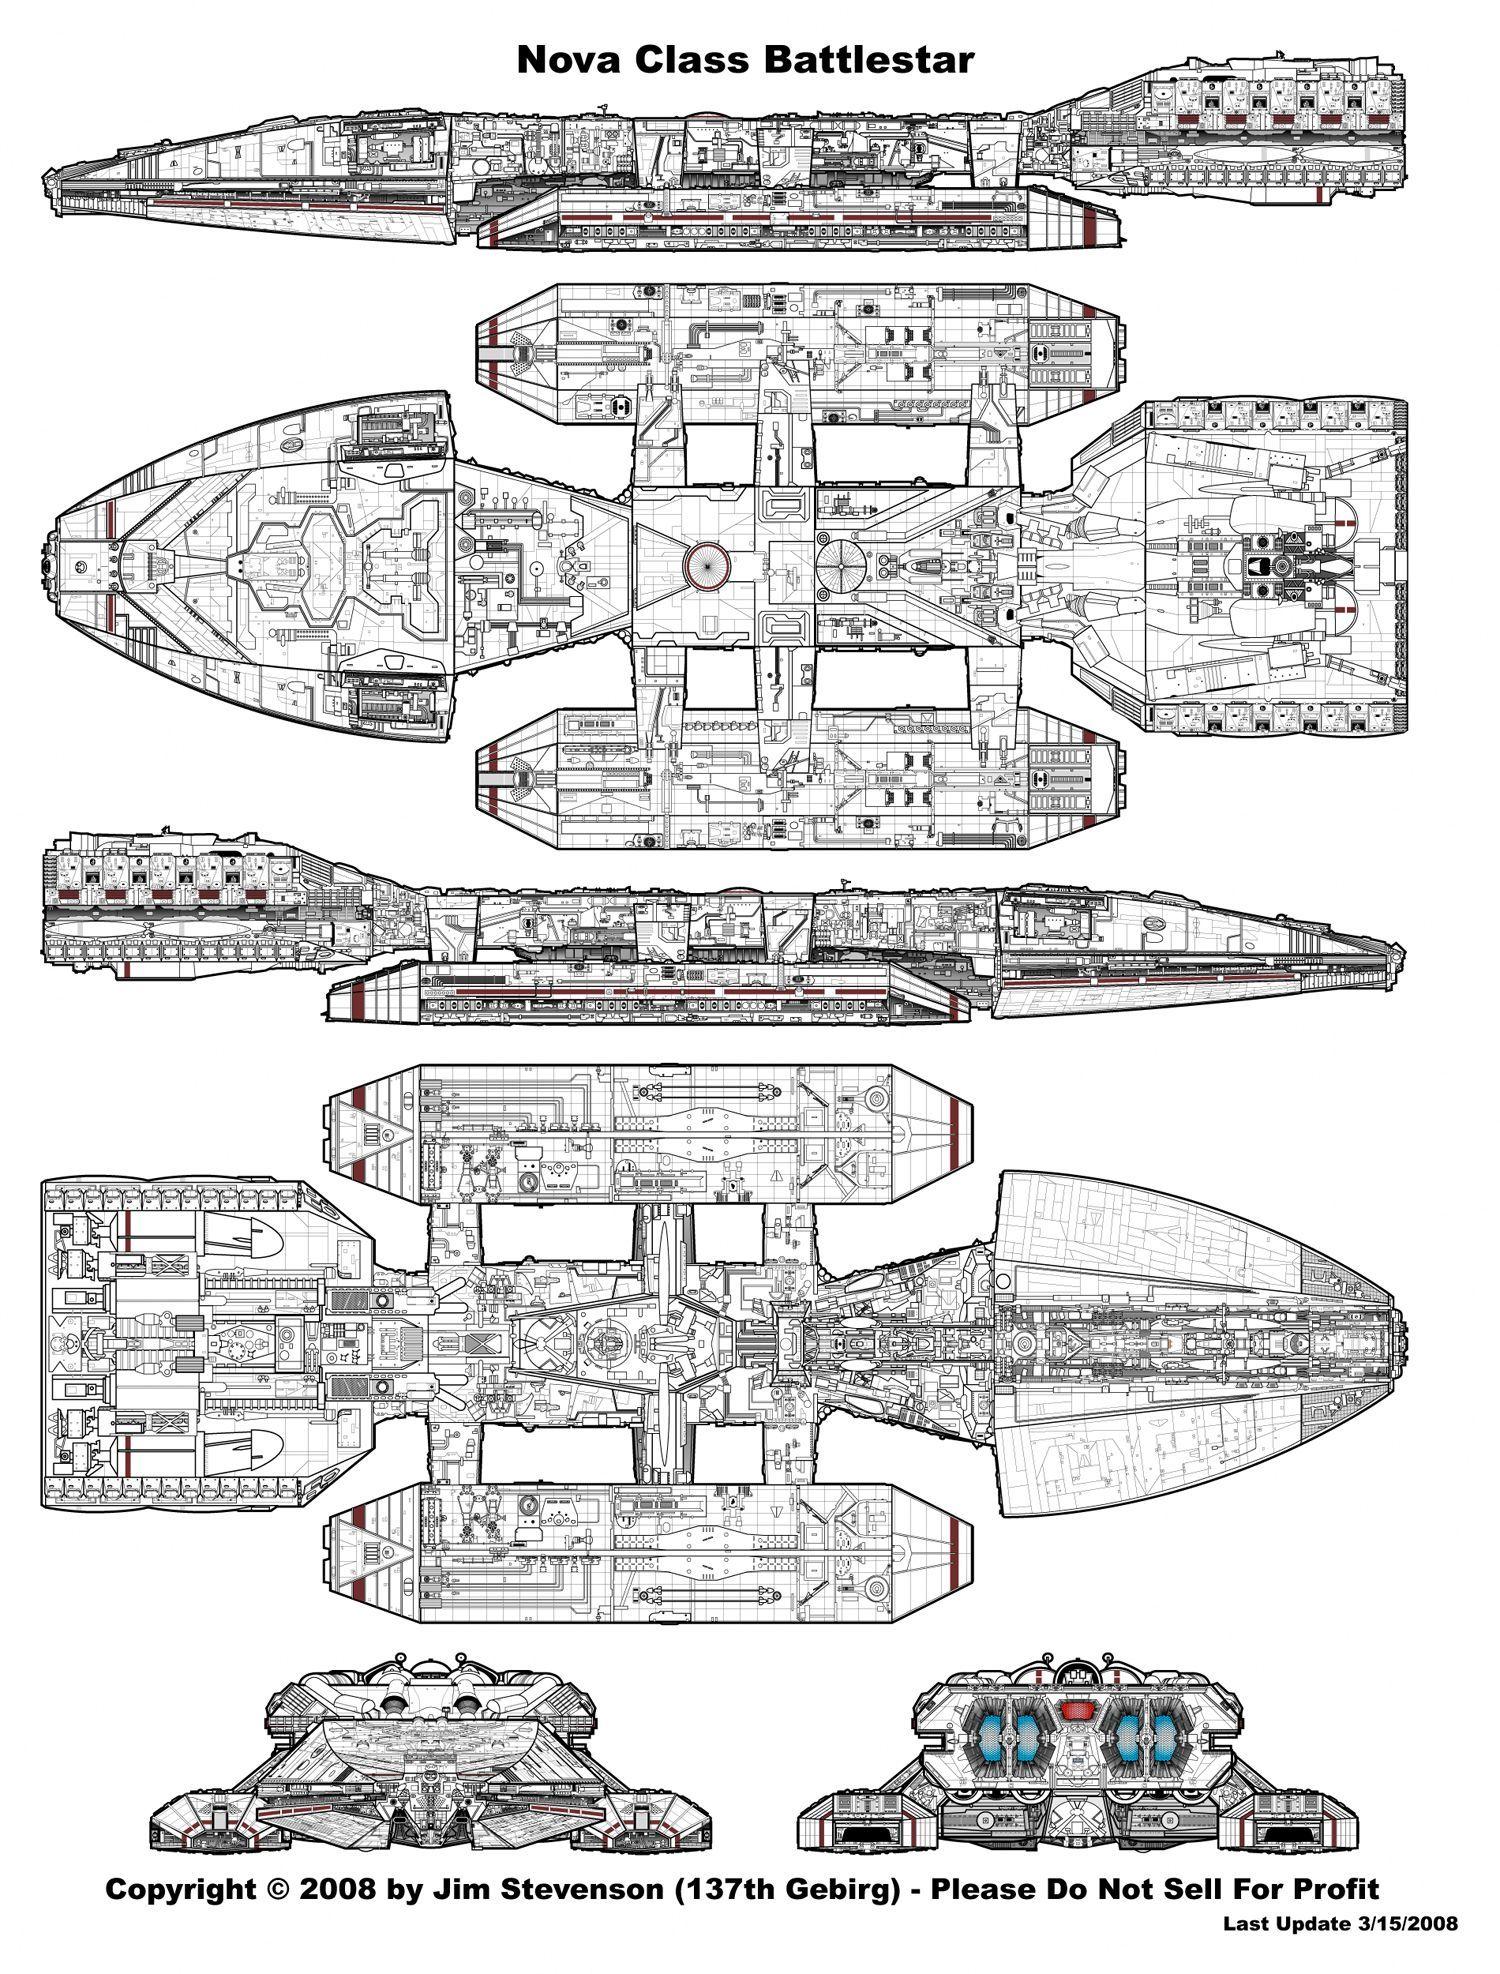 In the original Battlestar Galactica, 19781980, each of